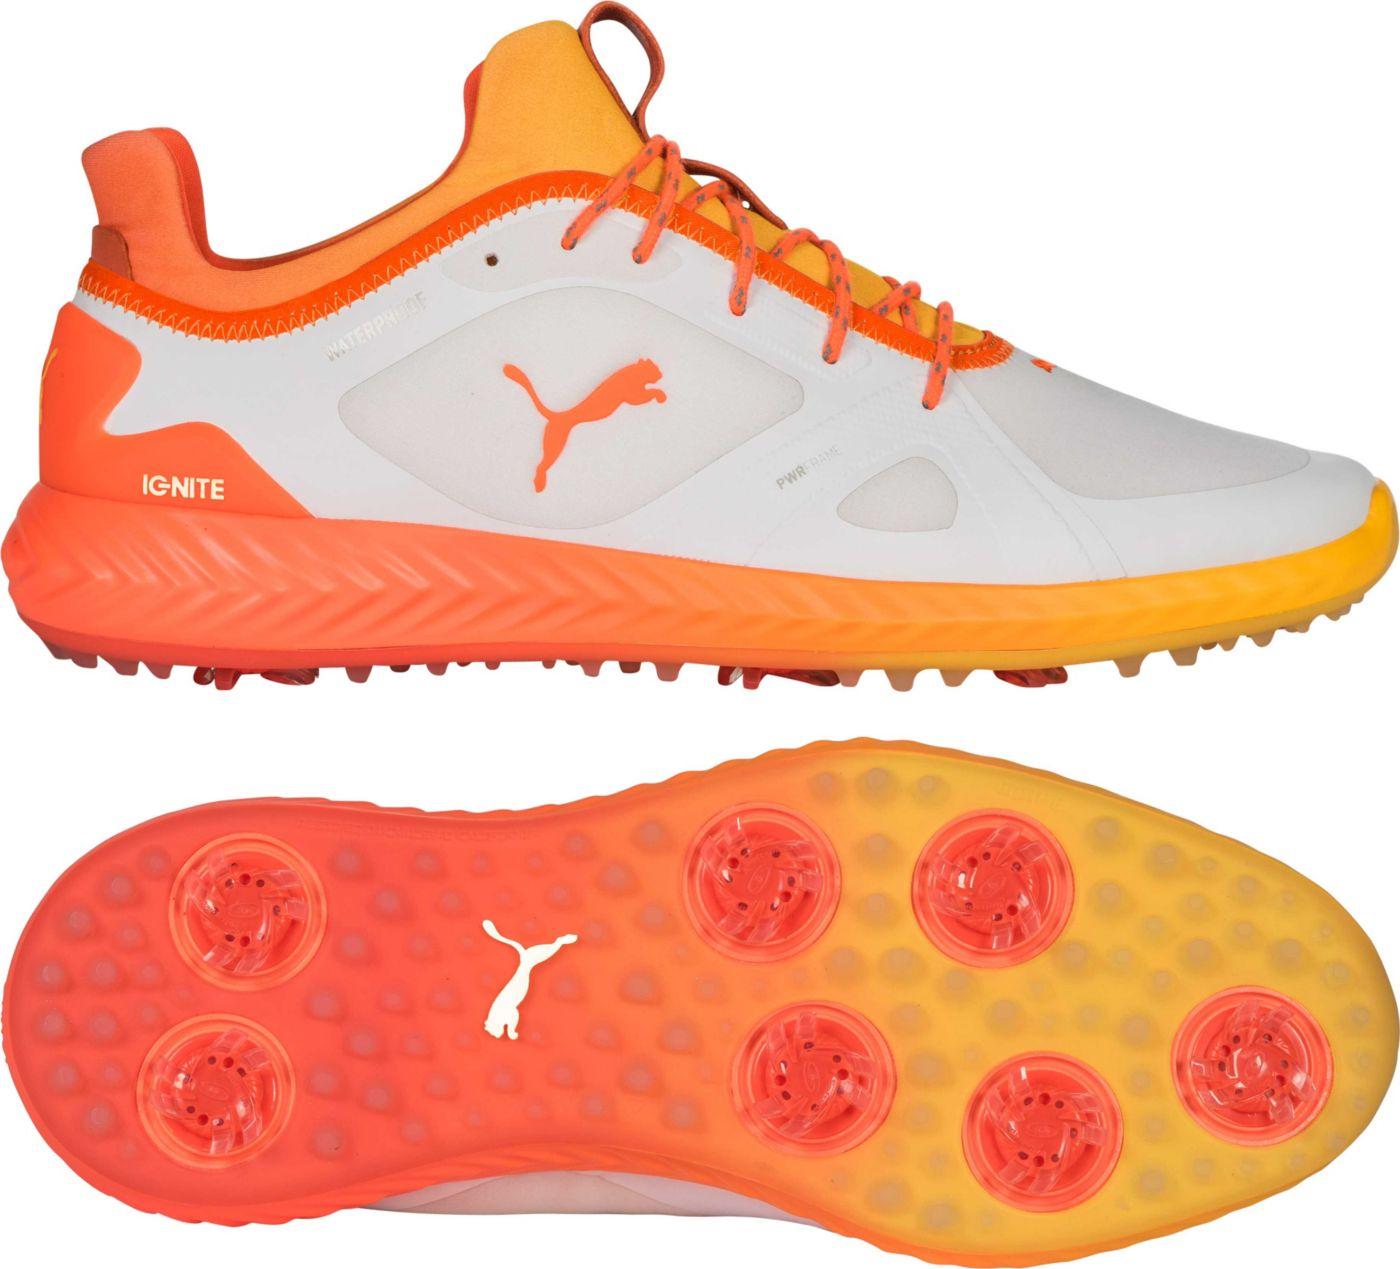 PUMA Men's Limited Edition IGNITE PWRADAPT SOLSTICE Golf Shoes